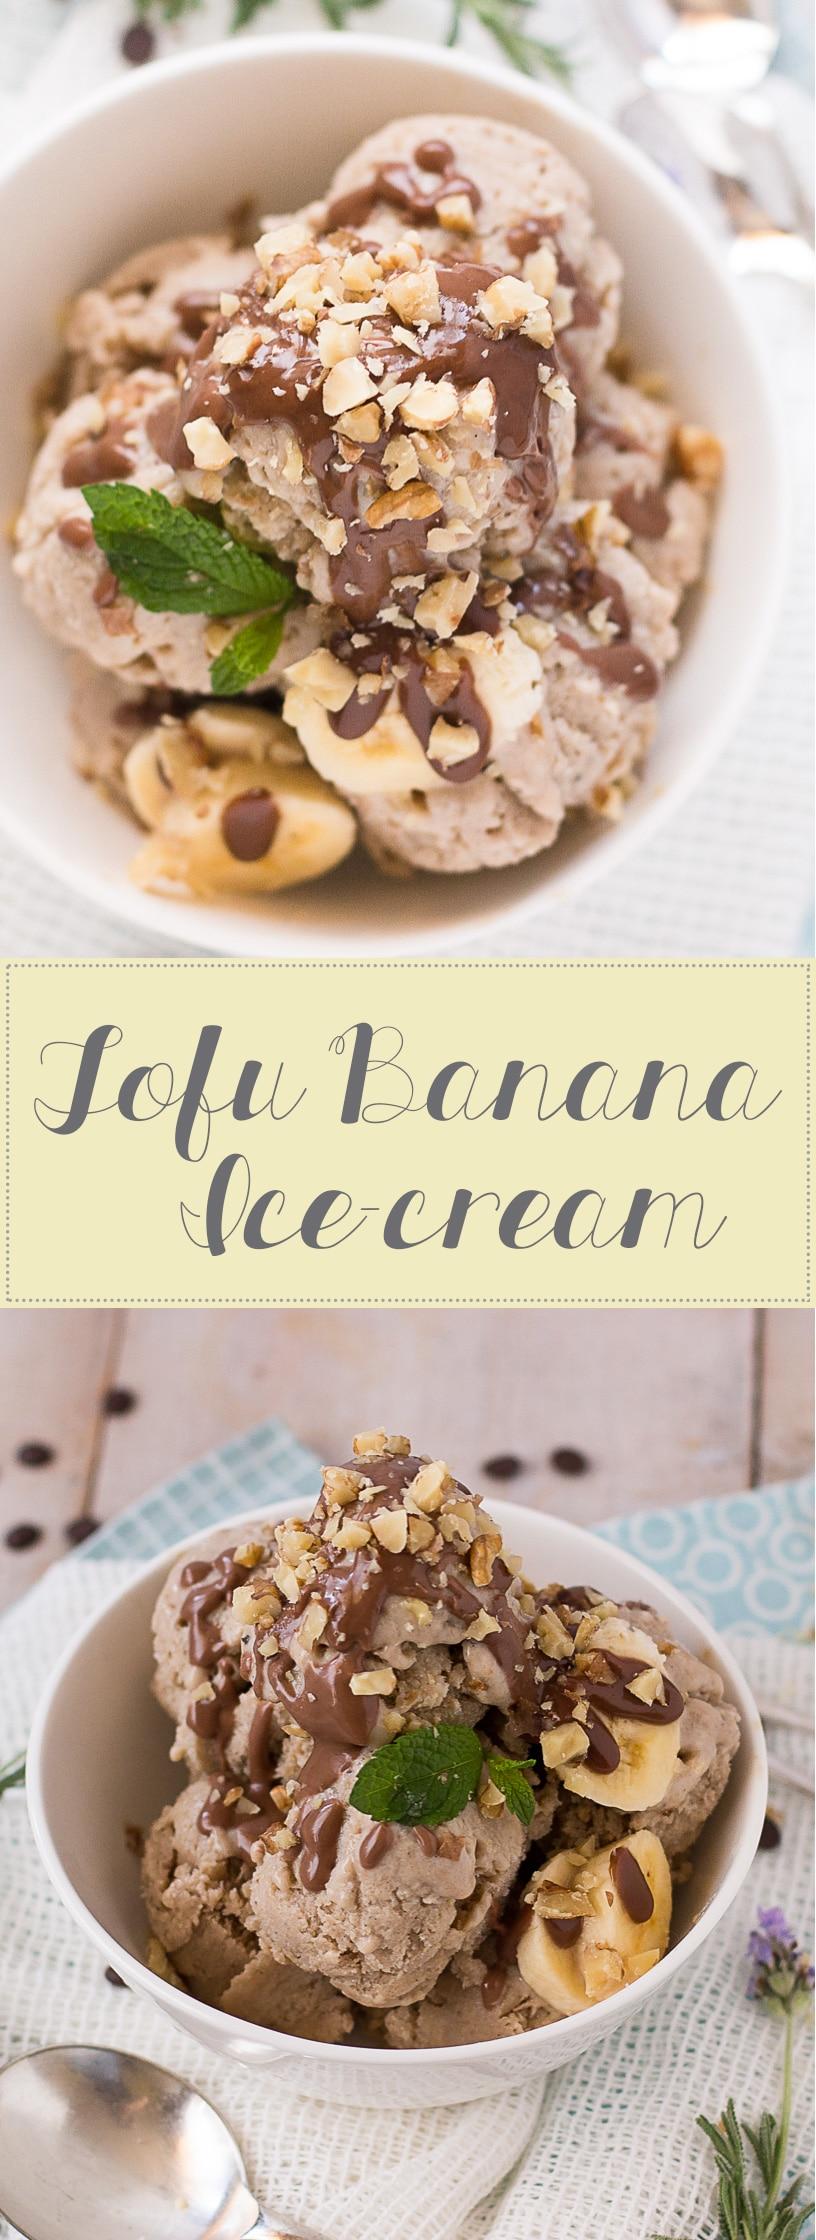 Tofu Banana Ice-cream collage